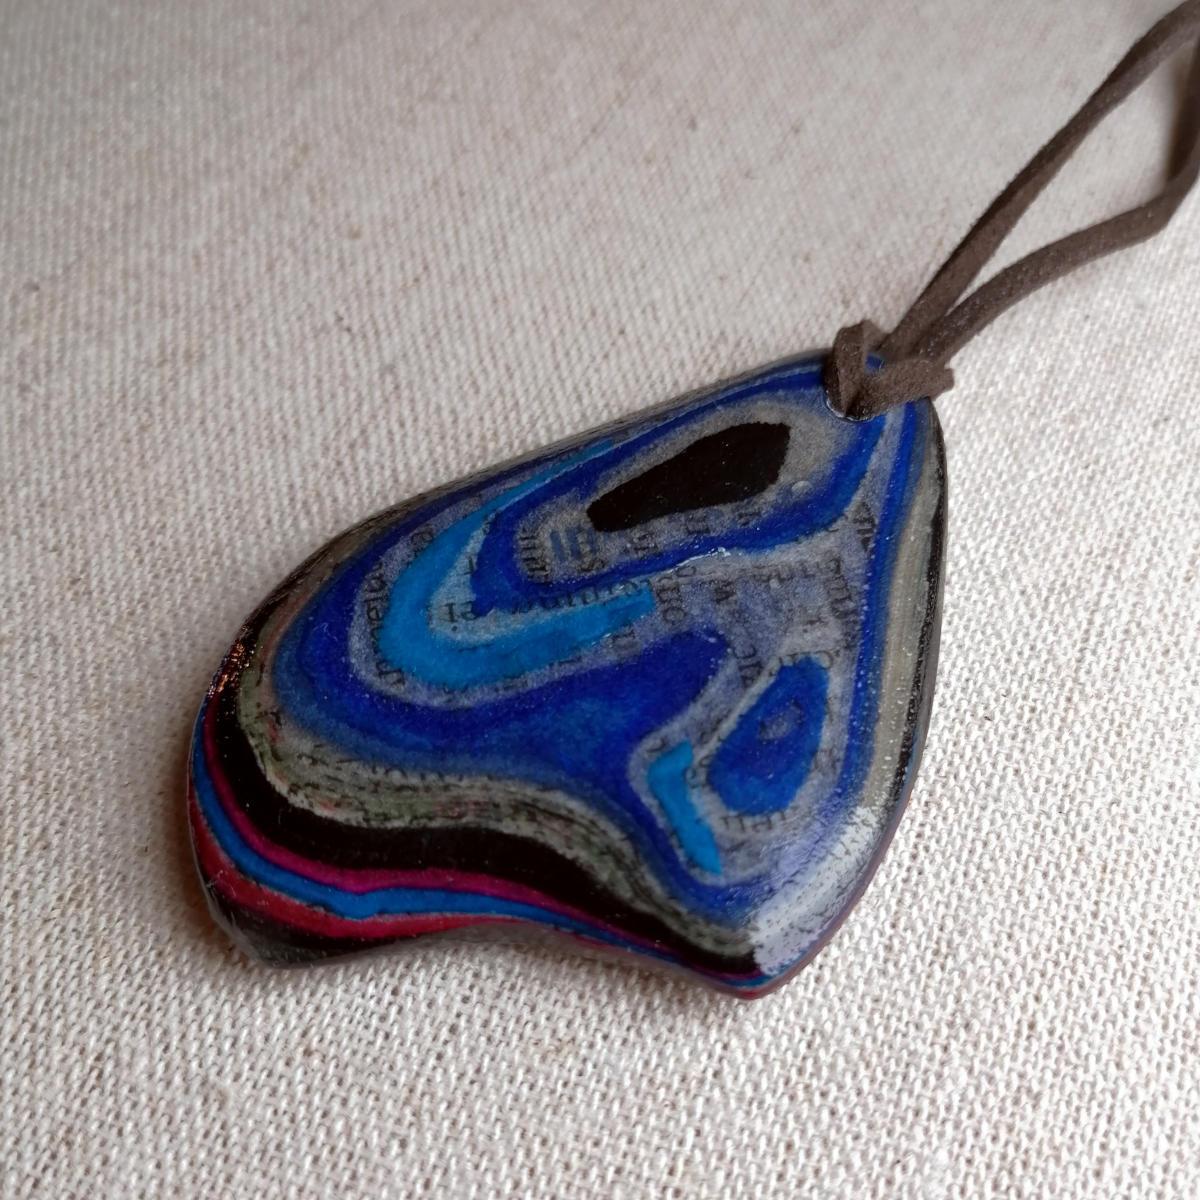 contemporary micarta jewellery art from Salzburg, Austria